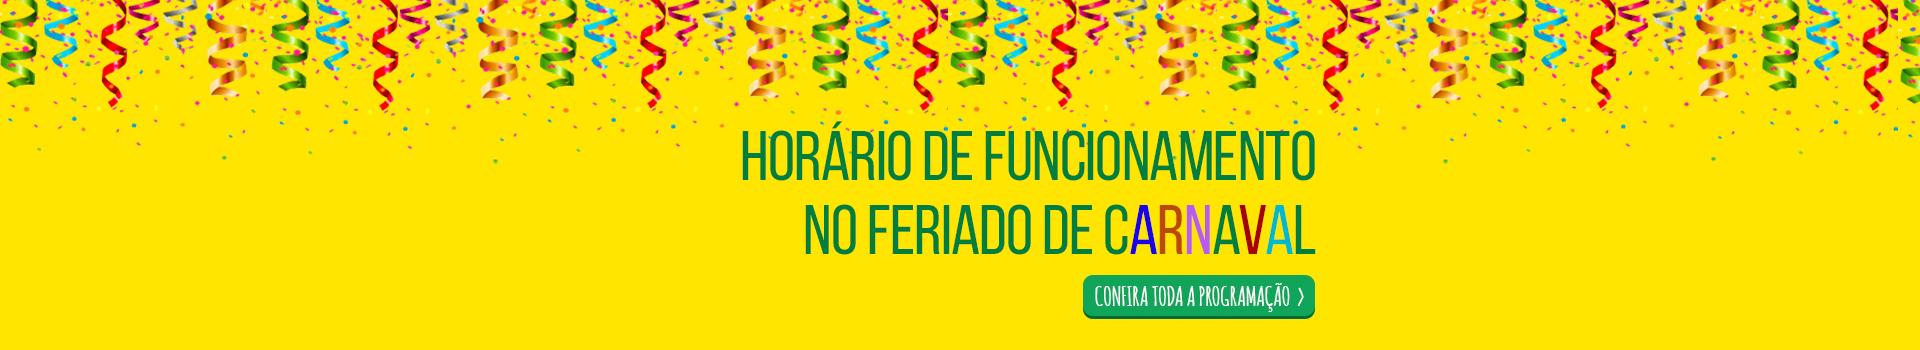 banner-horario-carnaval